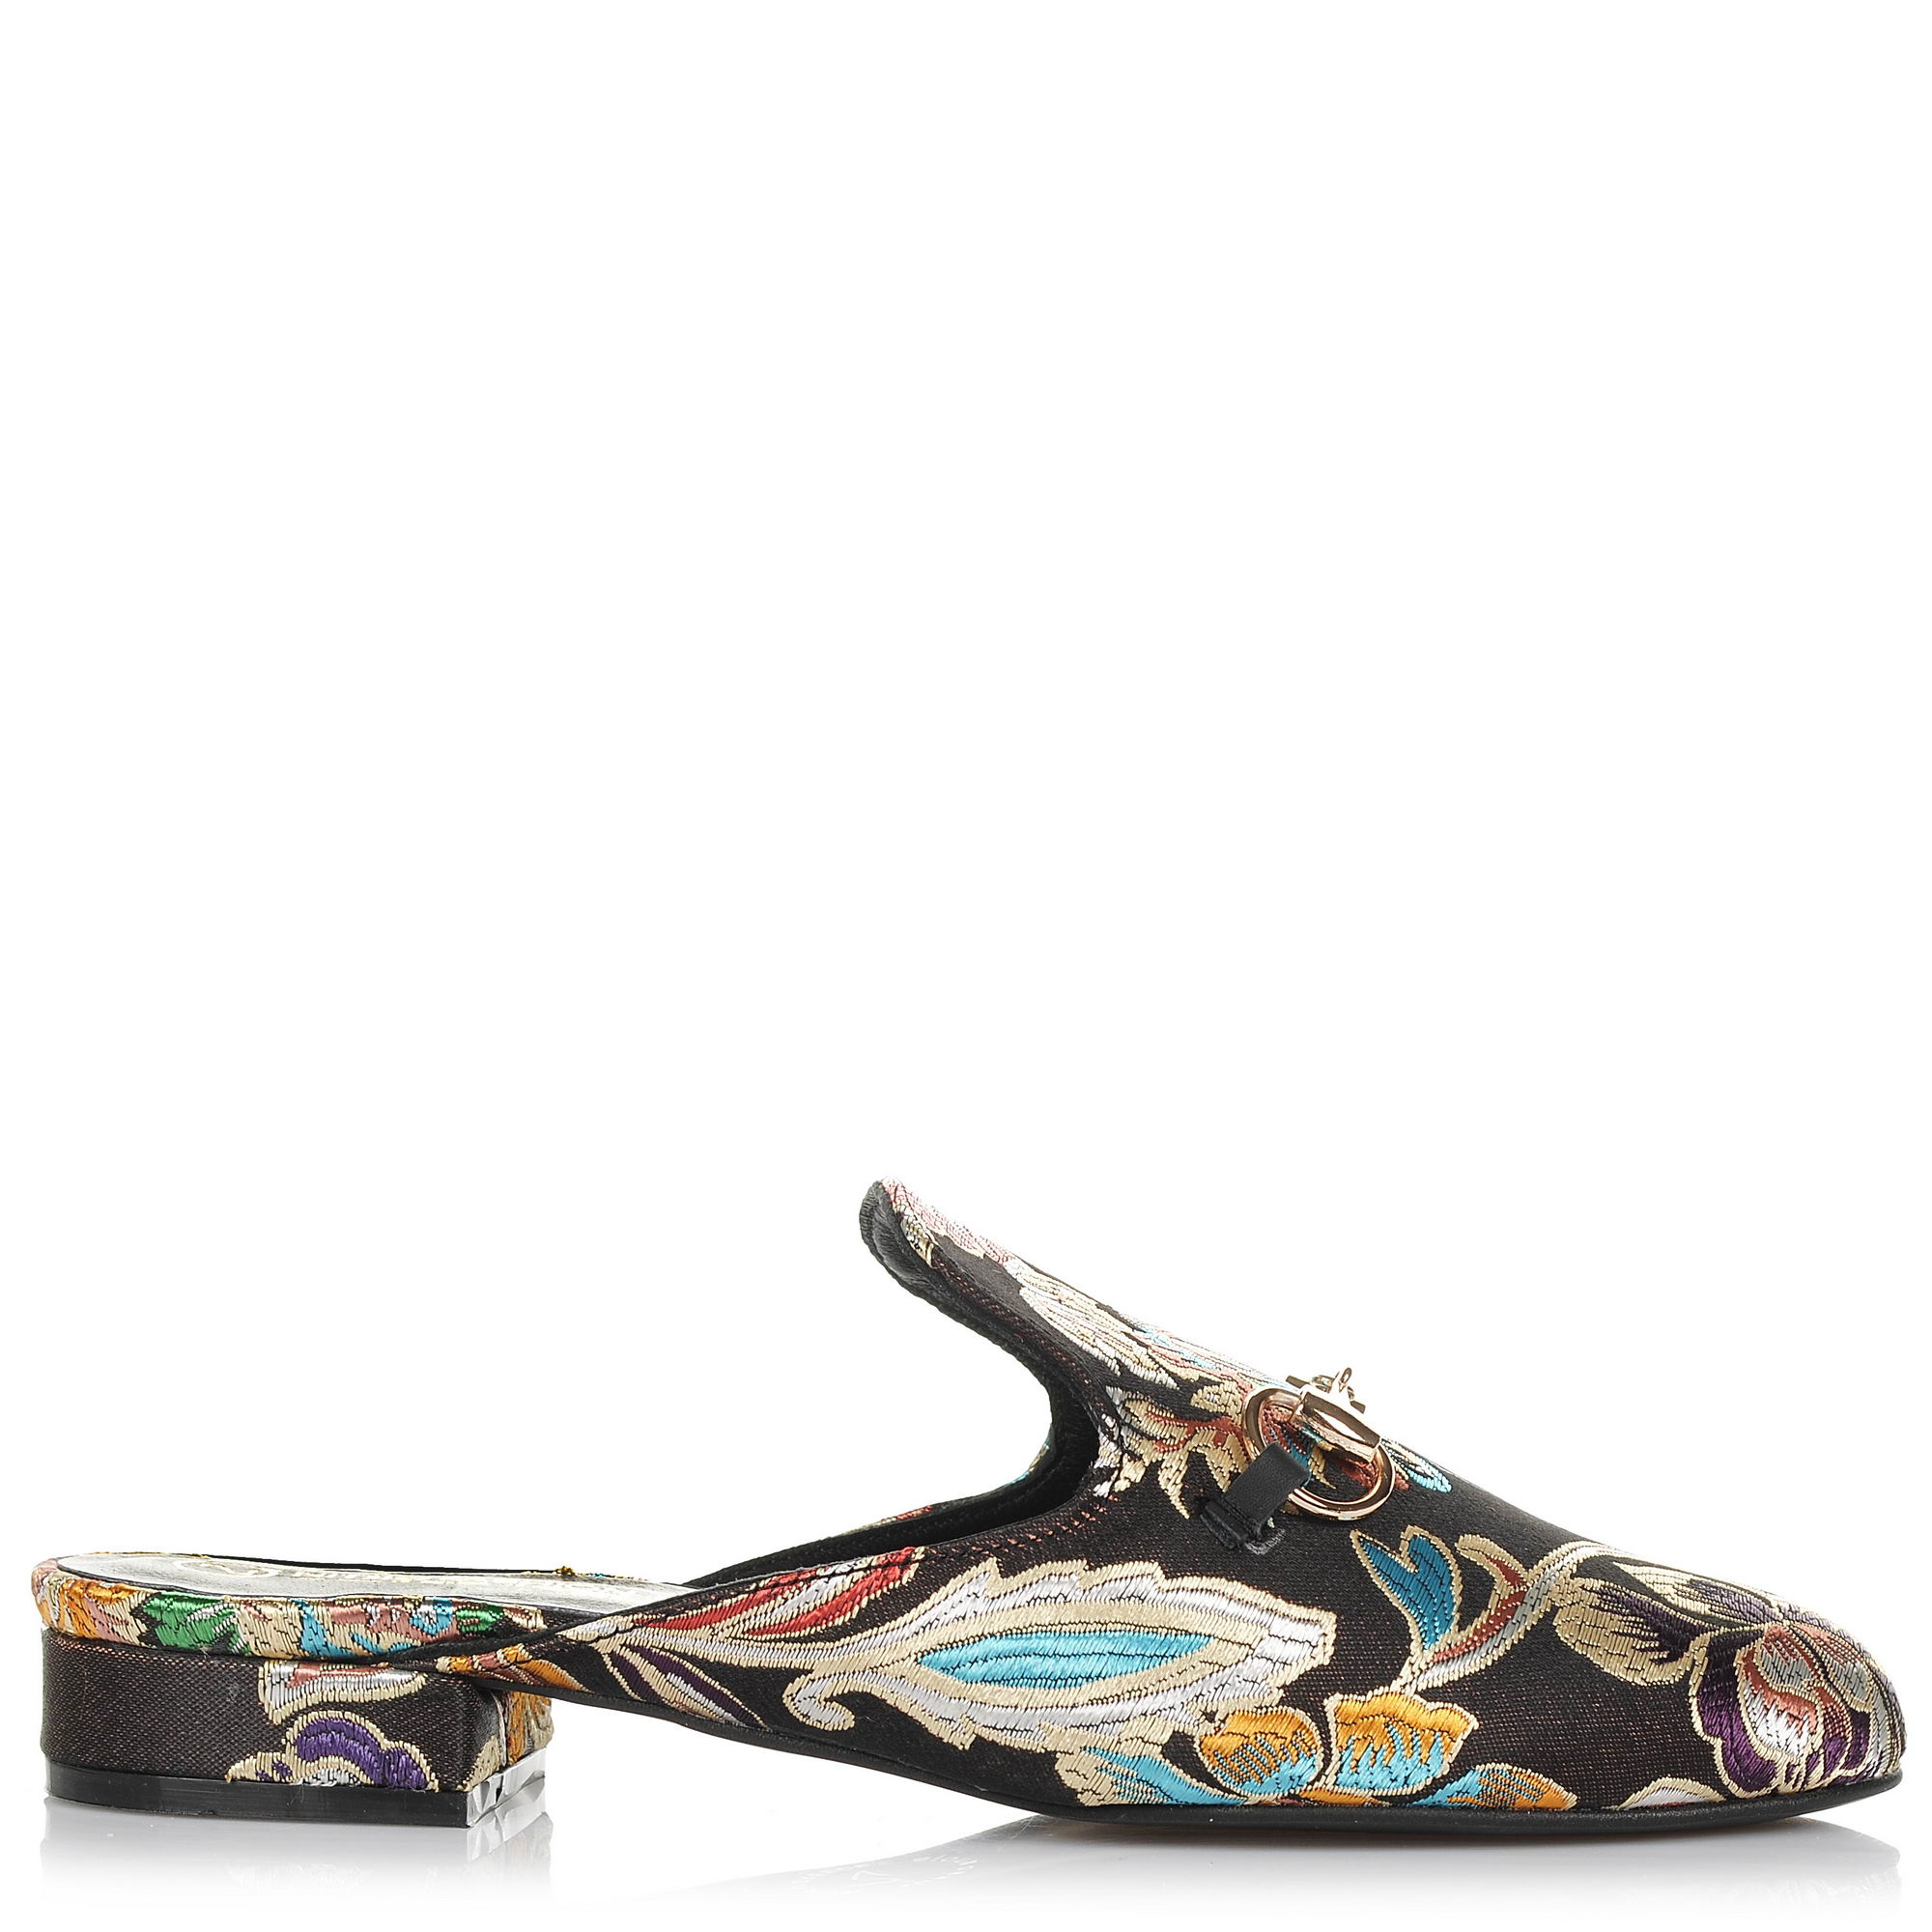 Mules Nitro Fashion SX10097M γυναικα   γυναικείο παπούτσι